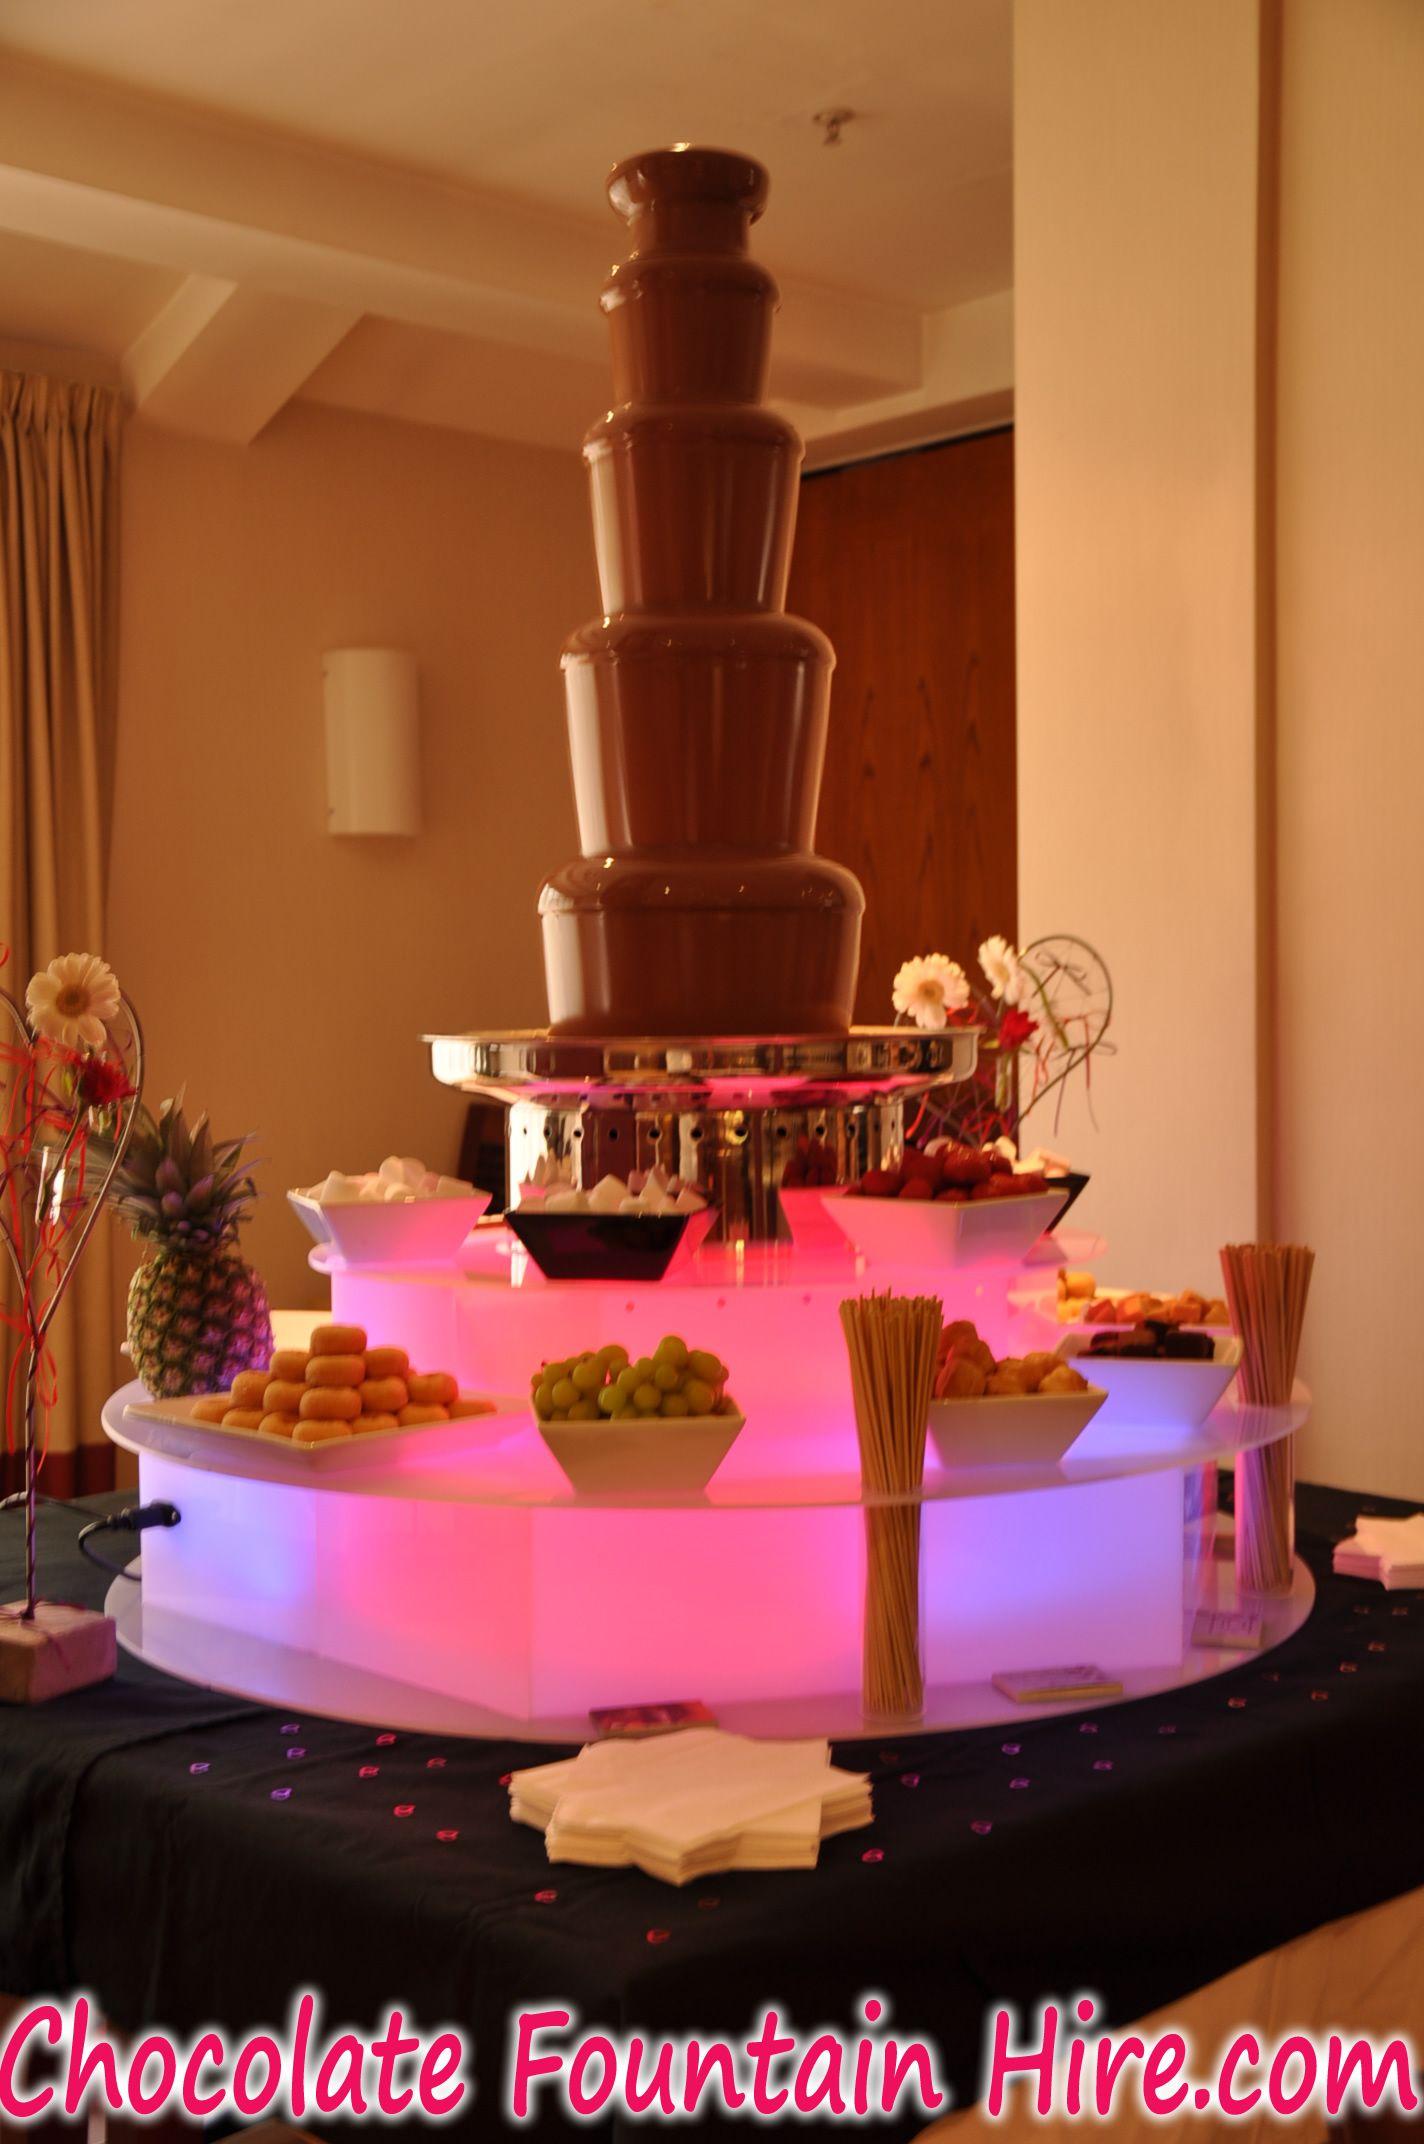 chocolate fountain hire northampton | heart wings | pinterest